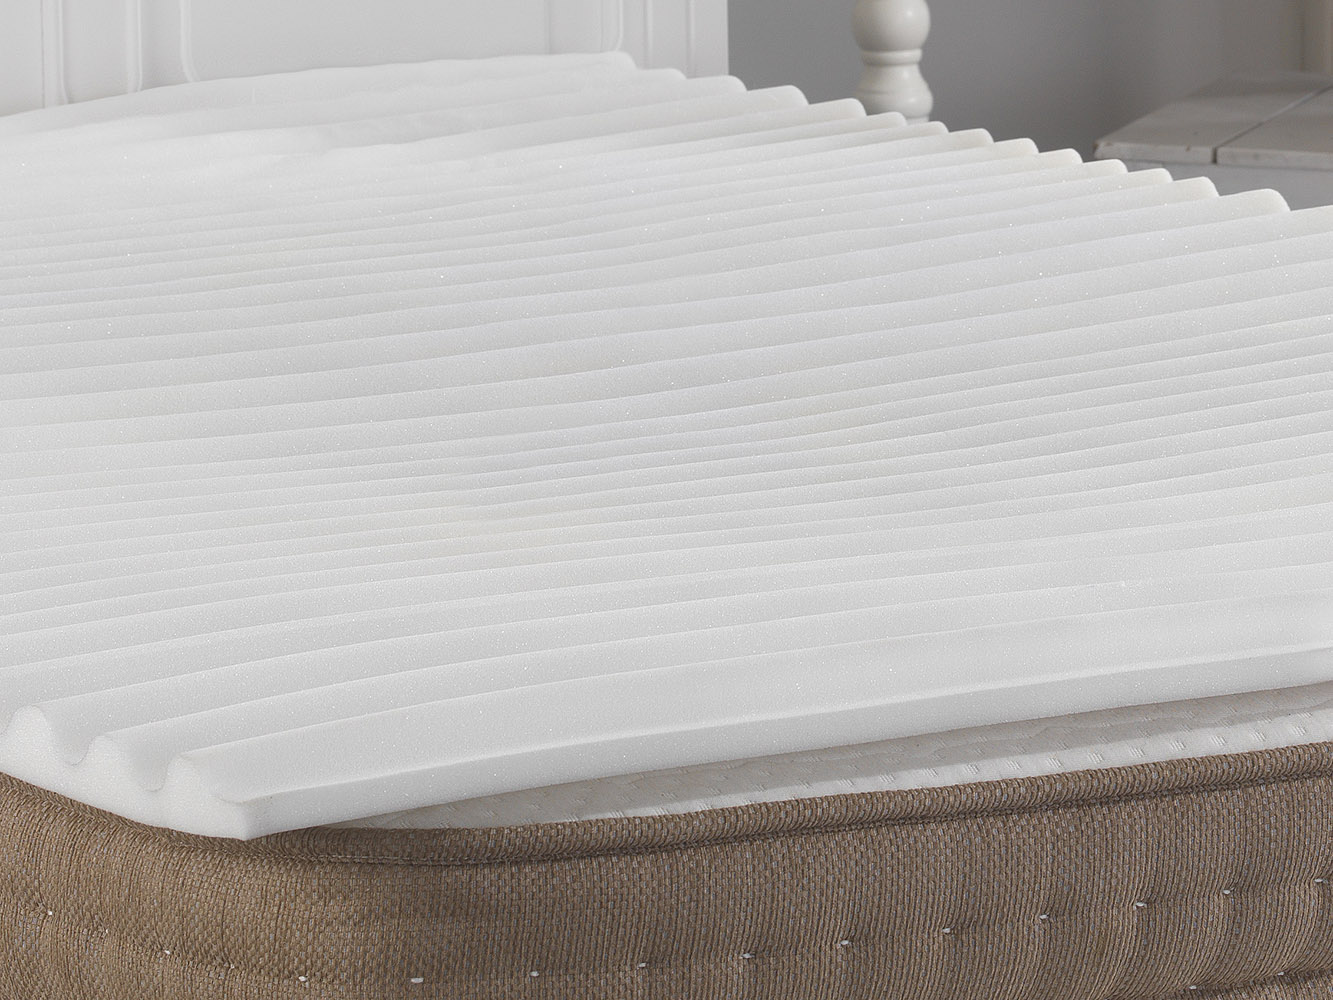 Firm Zoned Ridge Shape Foam Mattress Topper Slight